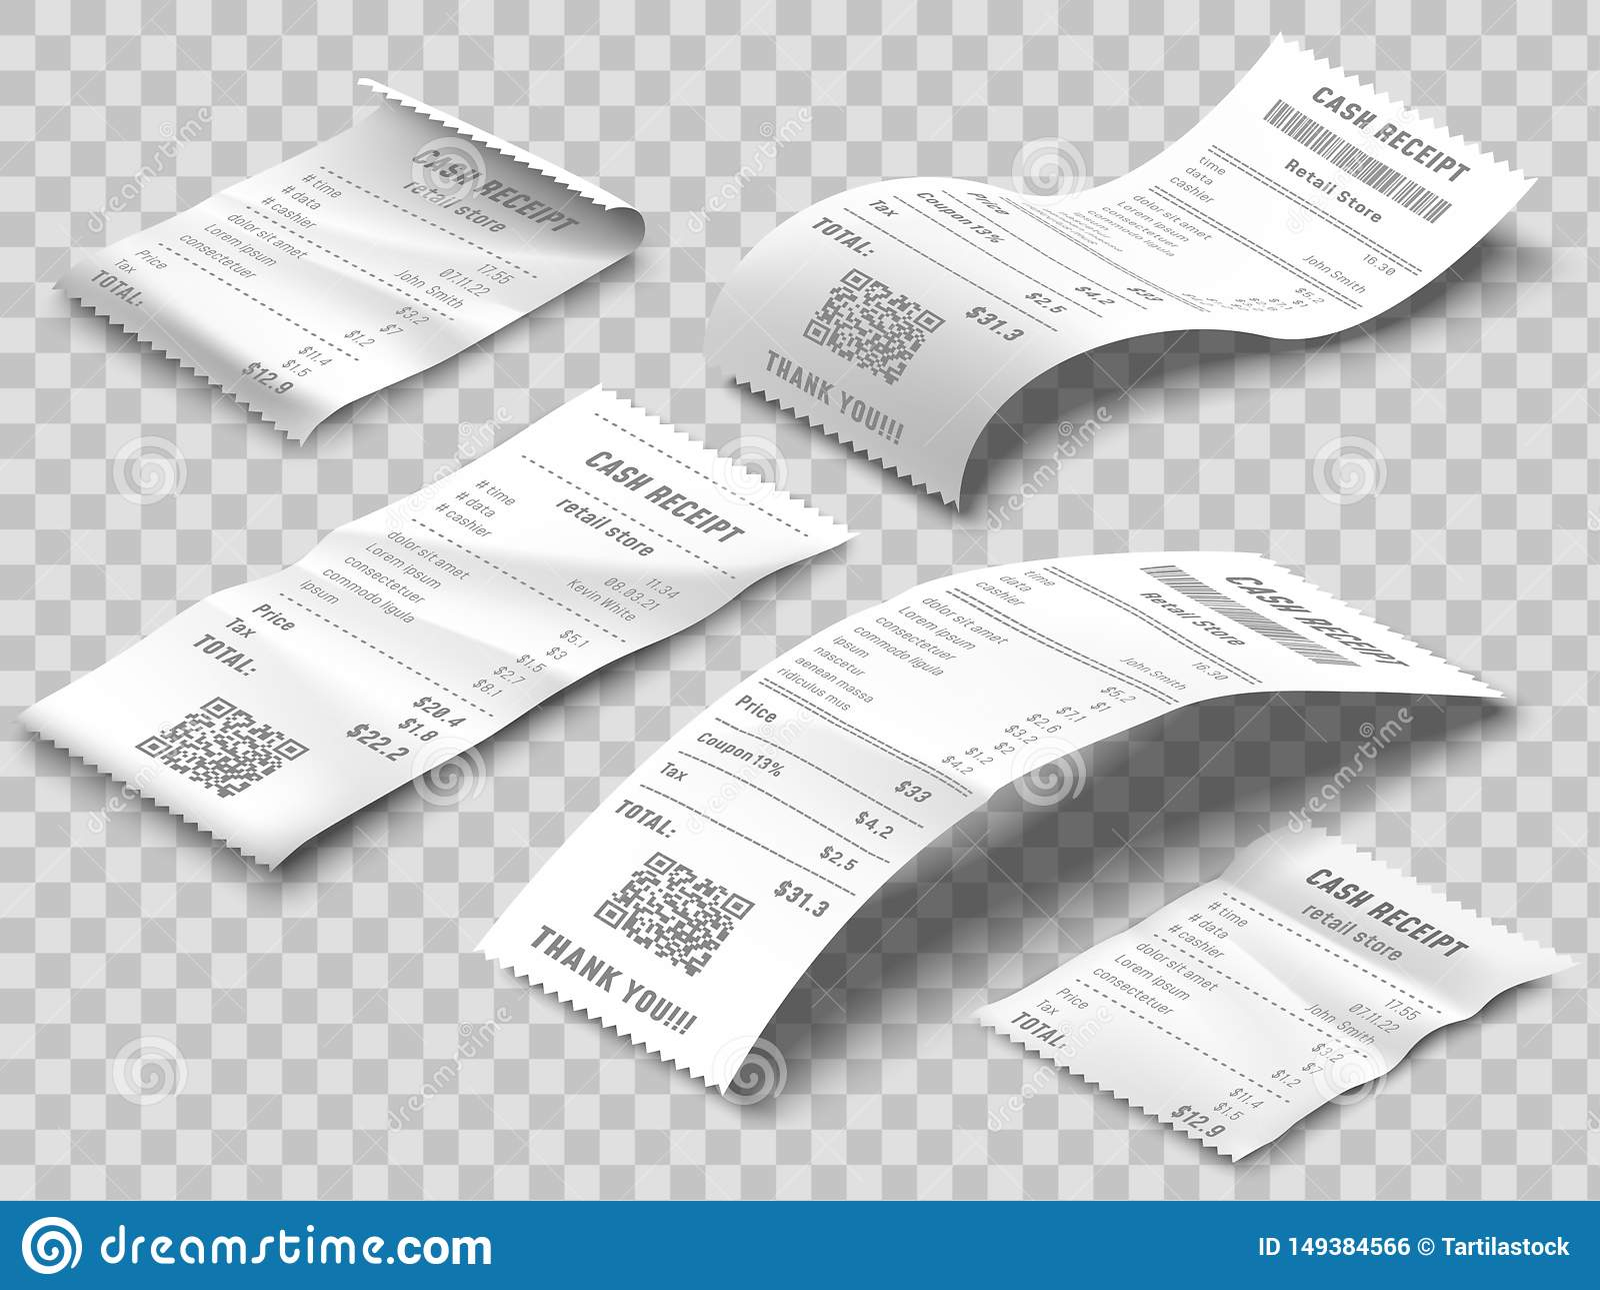 Isometric λογαριασμός παραλαβών Η τυπωμένη παραλαβή τιμολόγησης, οι λογαριασμοί πληρωμής και η οικονομική τράπεζα ελέγχουν απομον